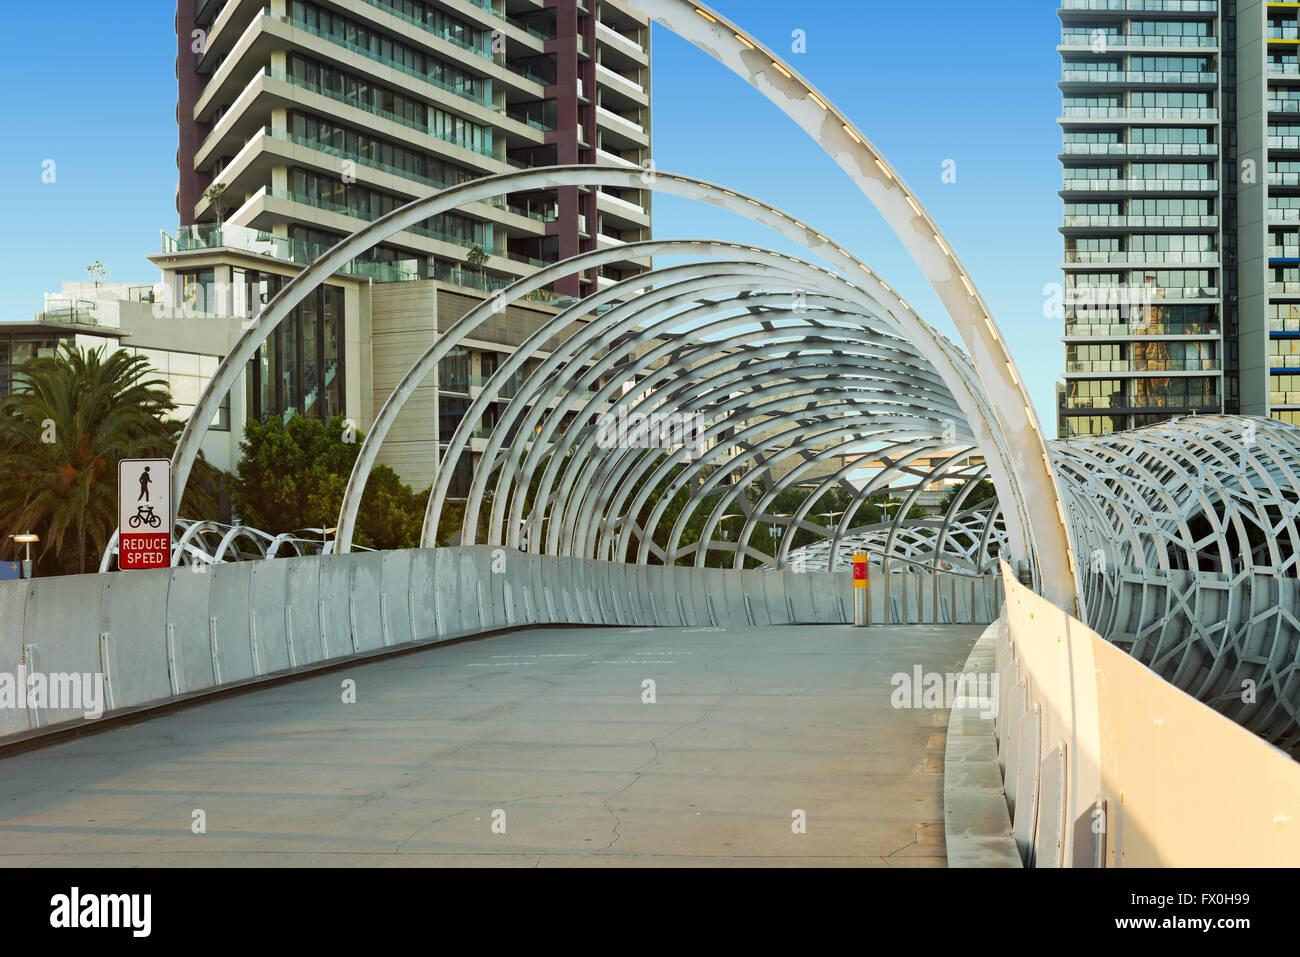 A photo of Webb bridge in Docklands, Melbourne. - Stock Image